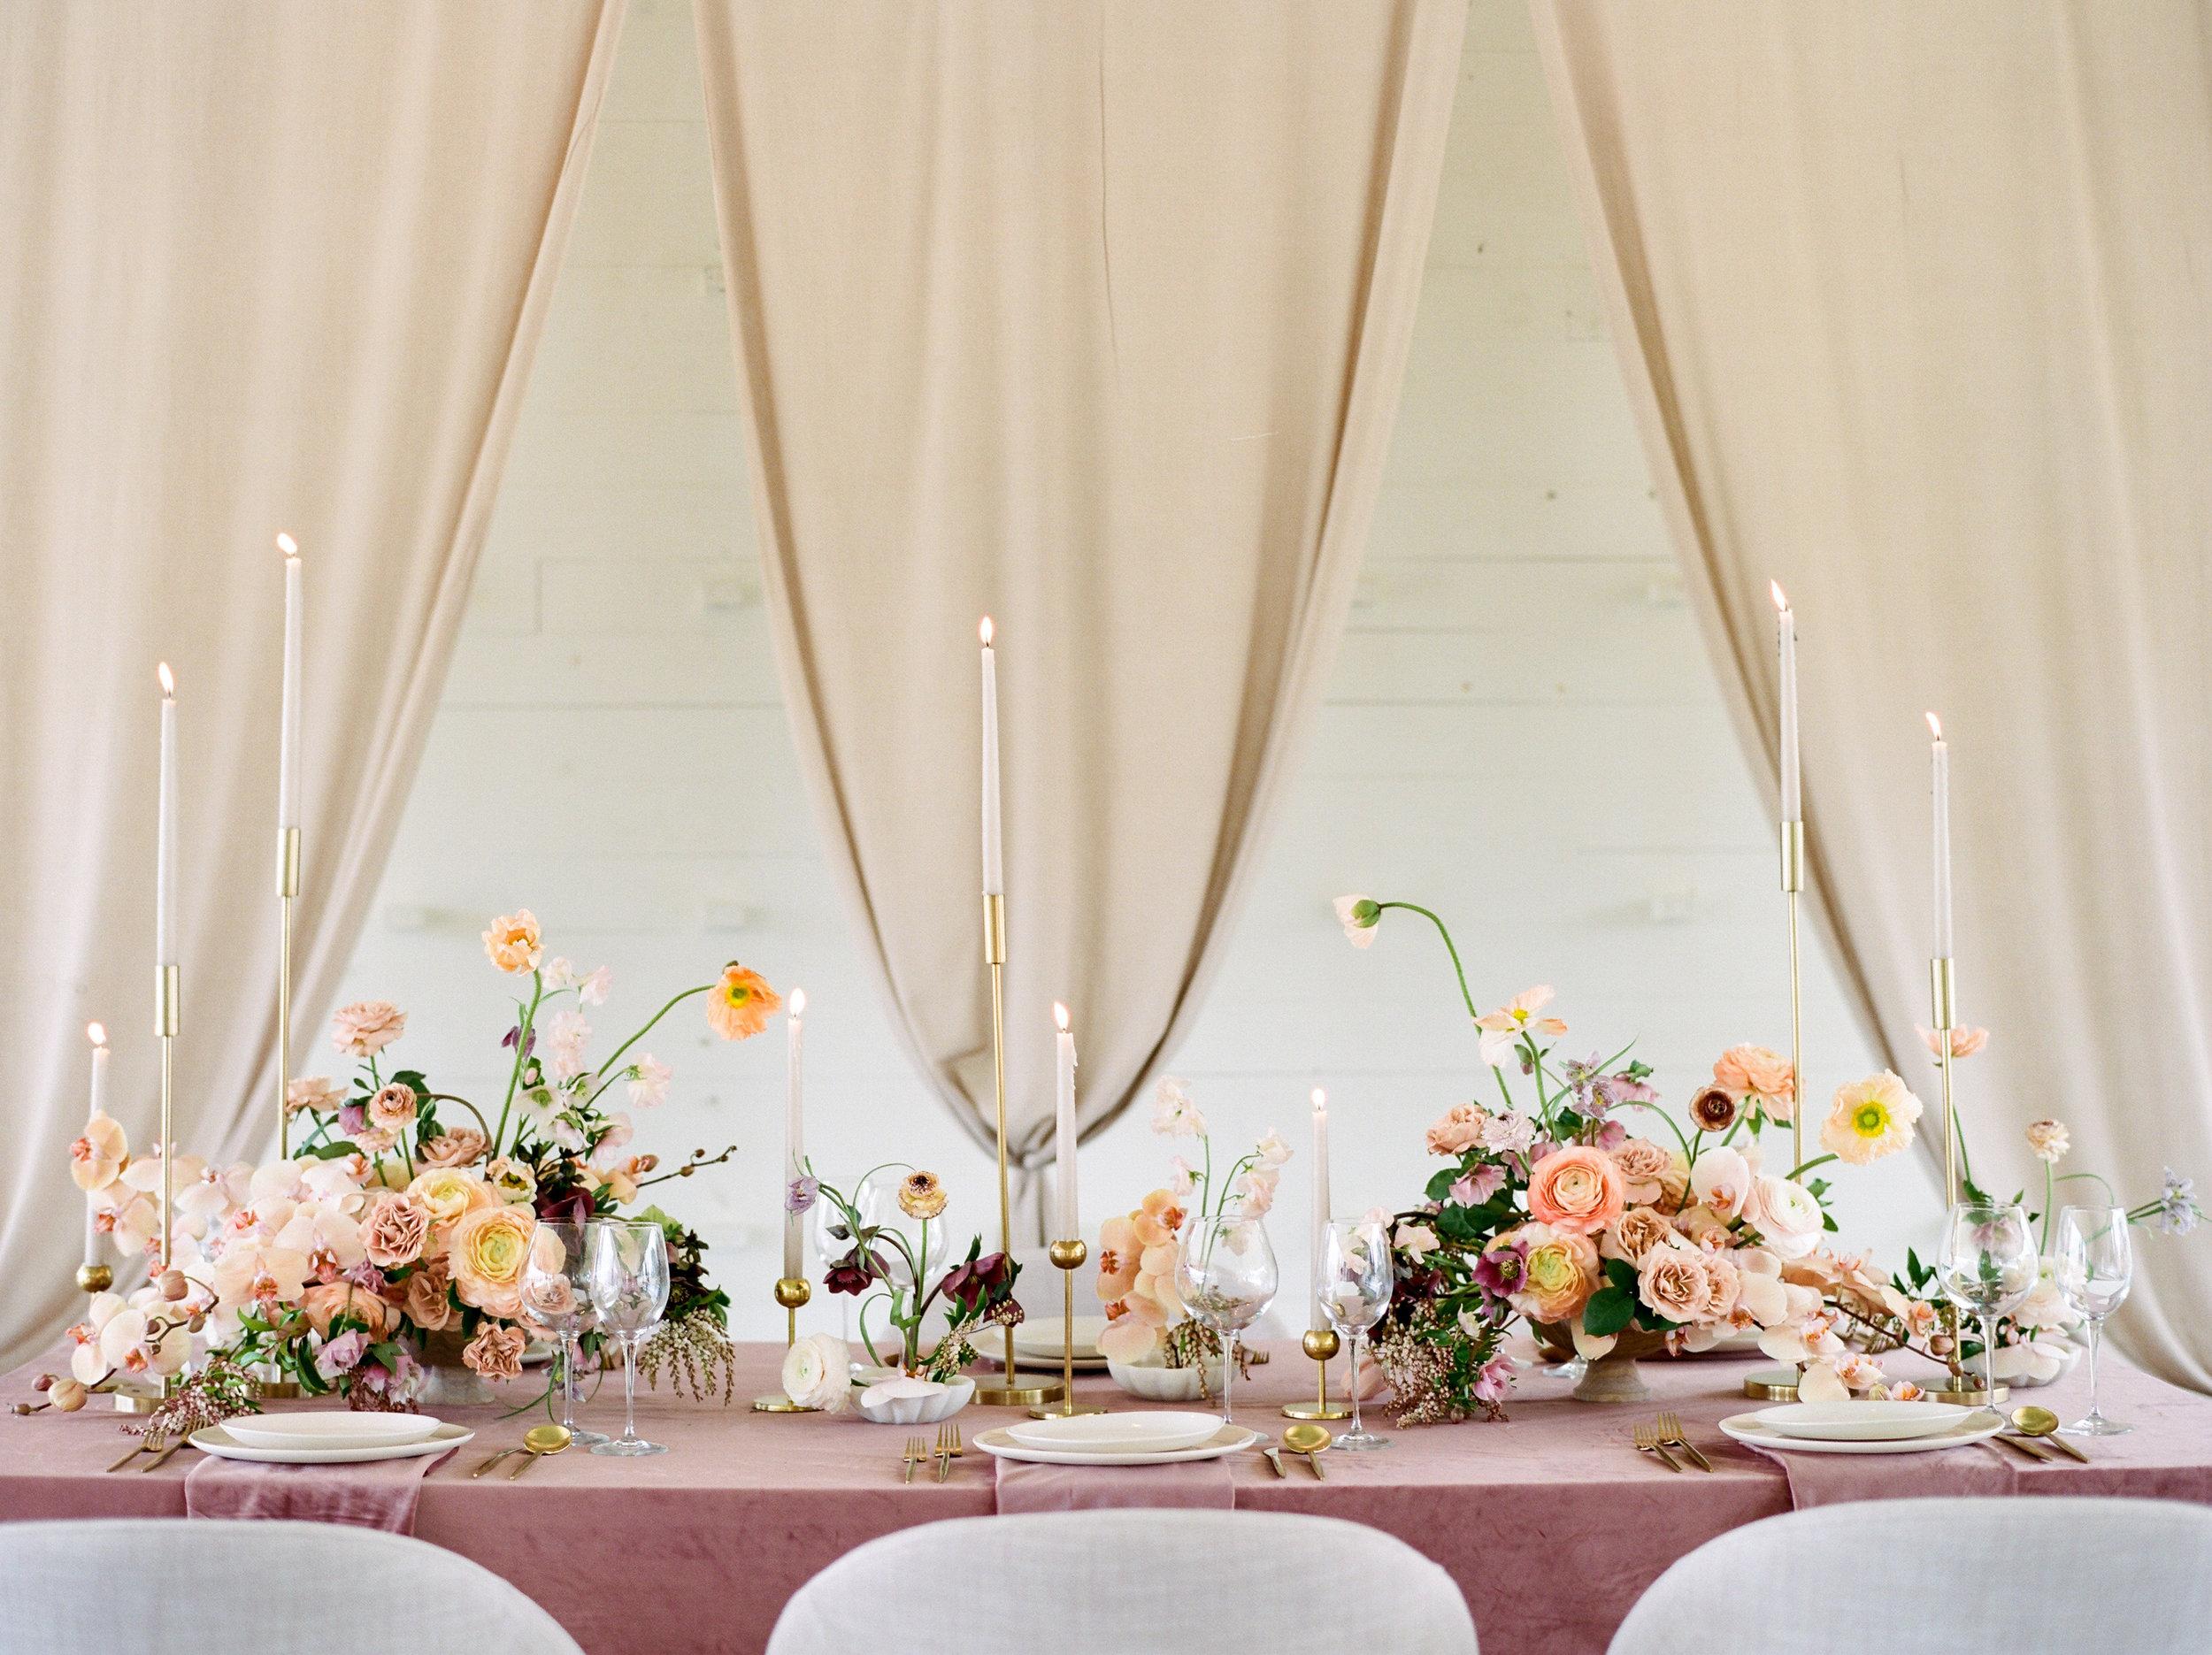 Austin-Wedding-Photography-Prospect-House-Fine-Art-Film-Destination-Dana-Josh-Fernandez-Photography-Dallas-Houston-Luxury-Best-Top-5.jpg